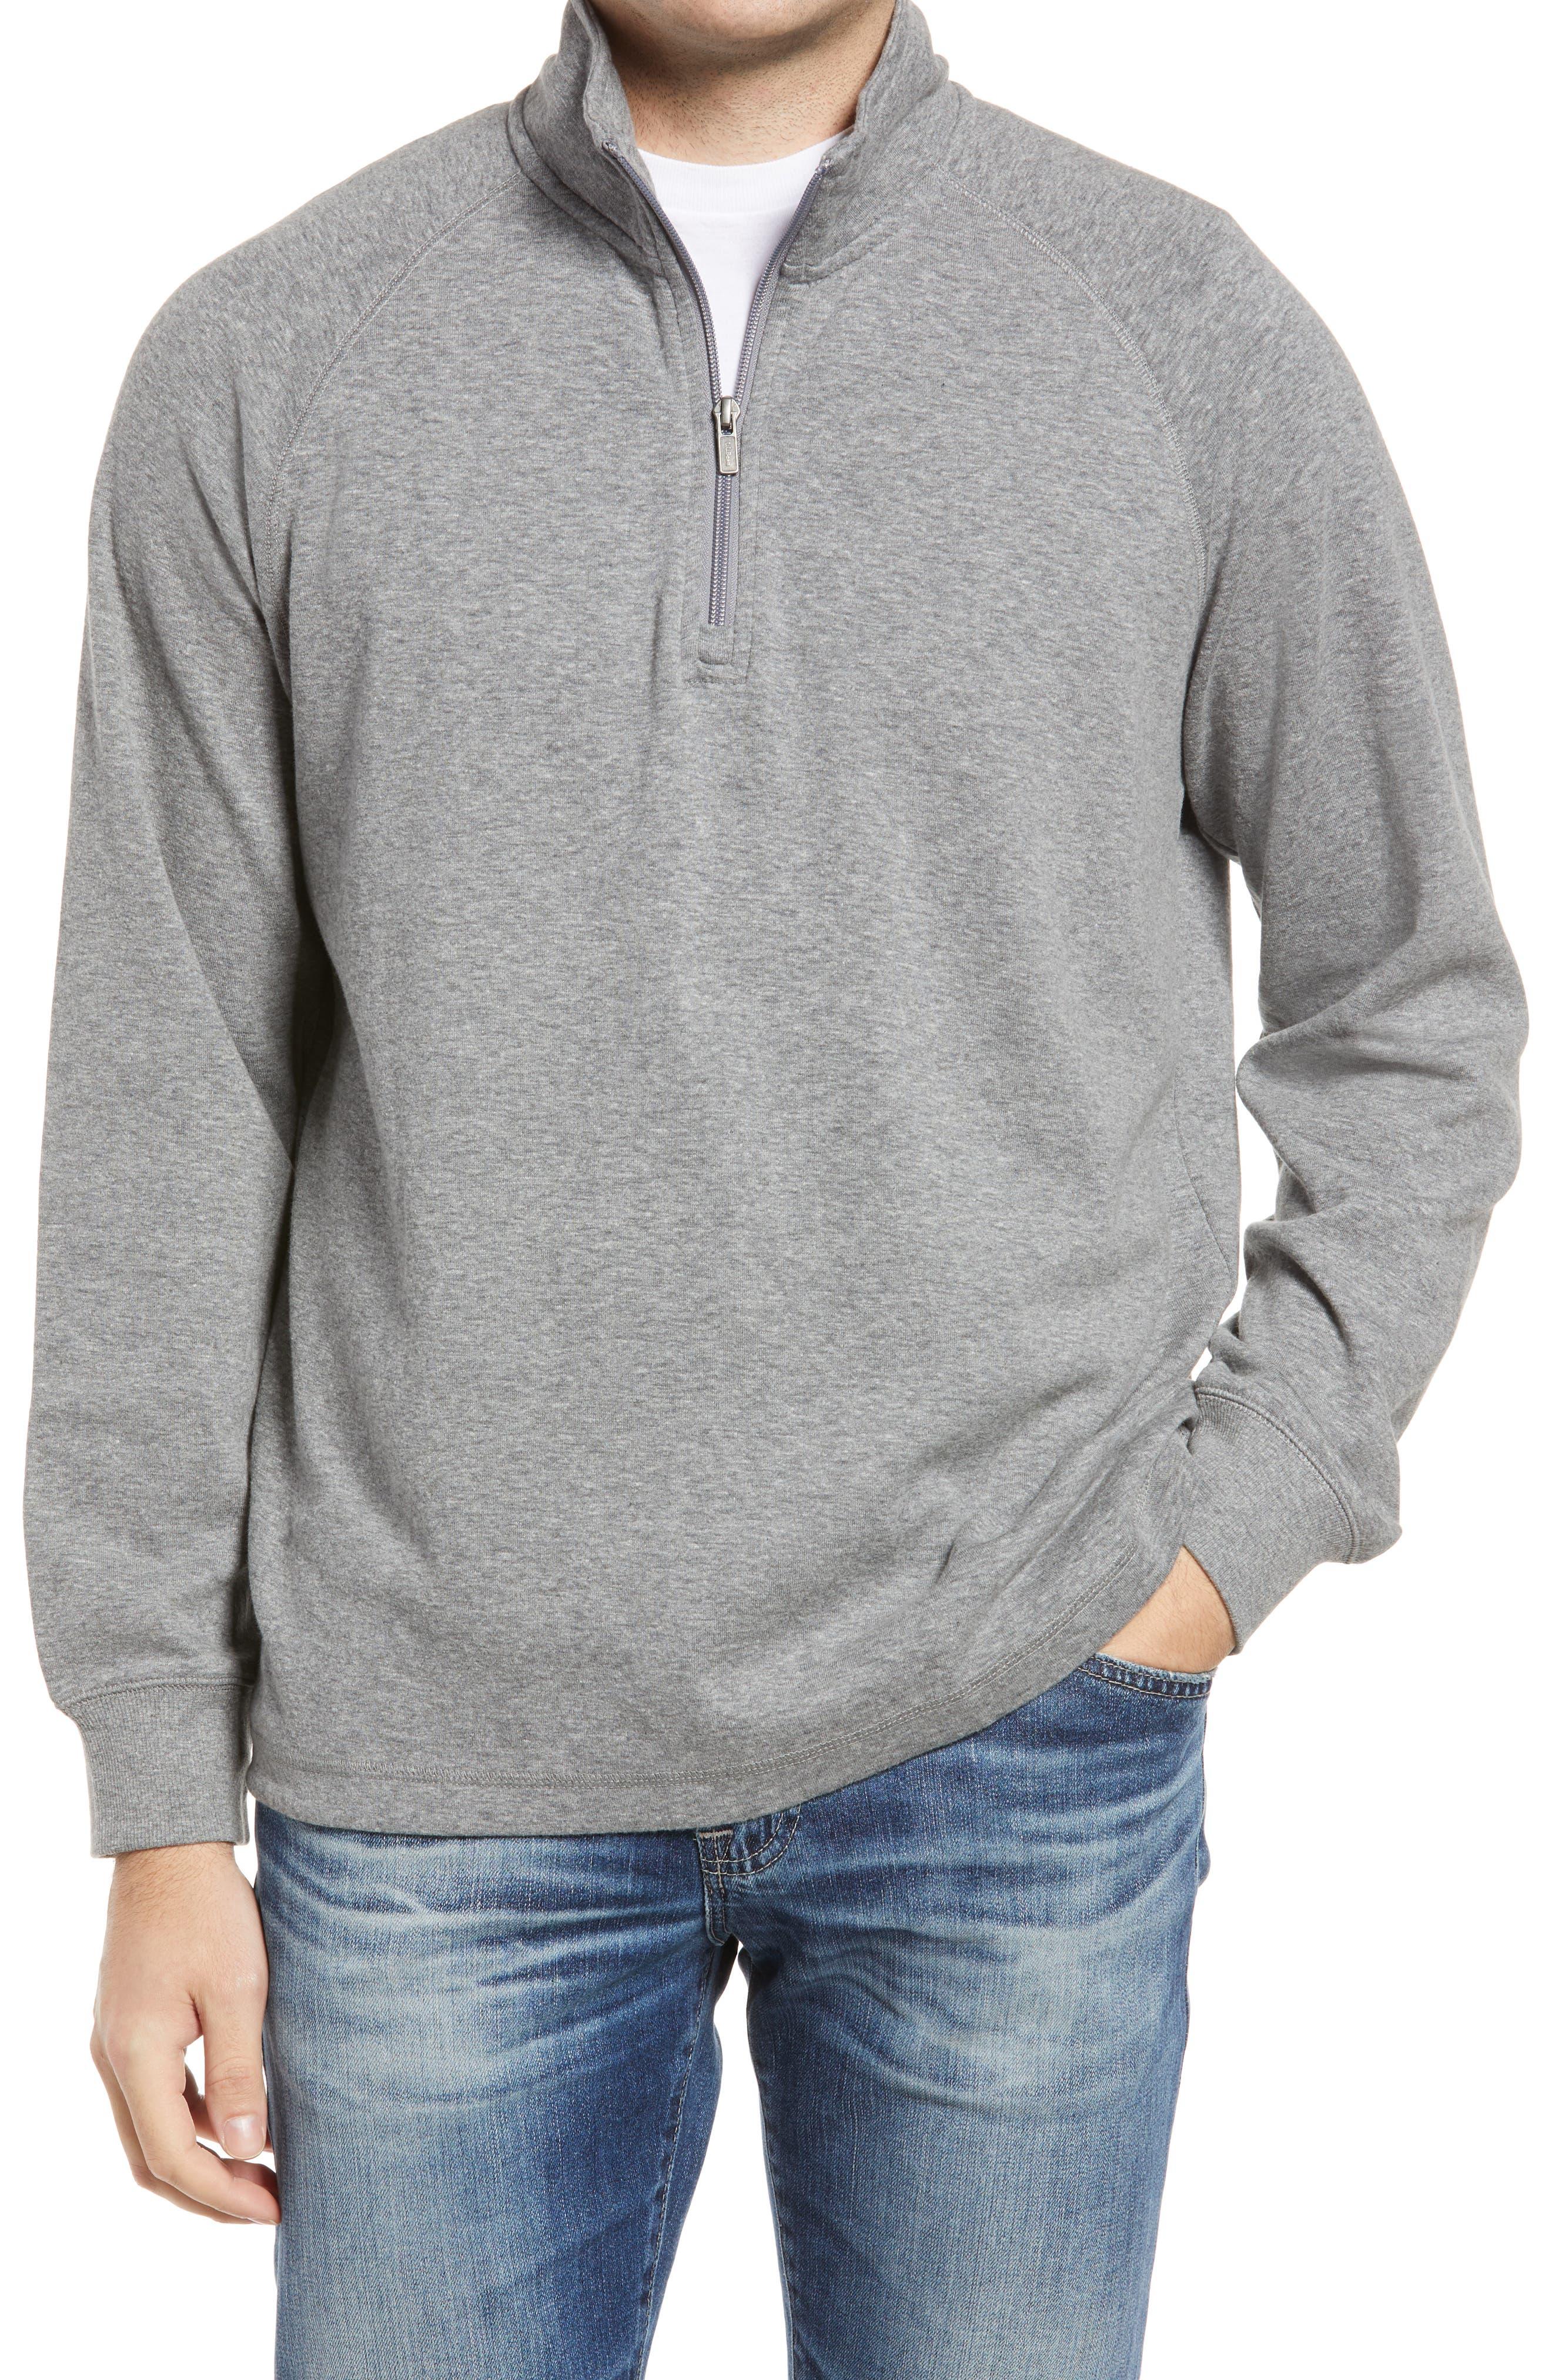 Men's Washed Cotton Quarter Zip Pullover